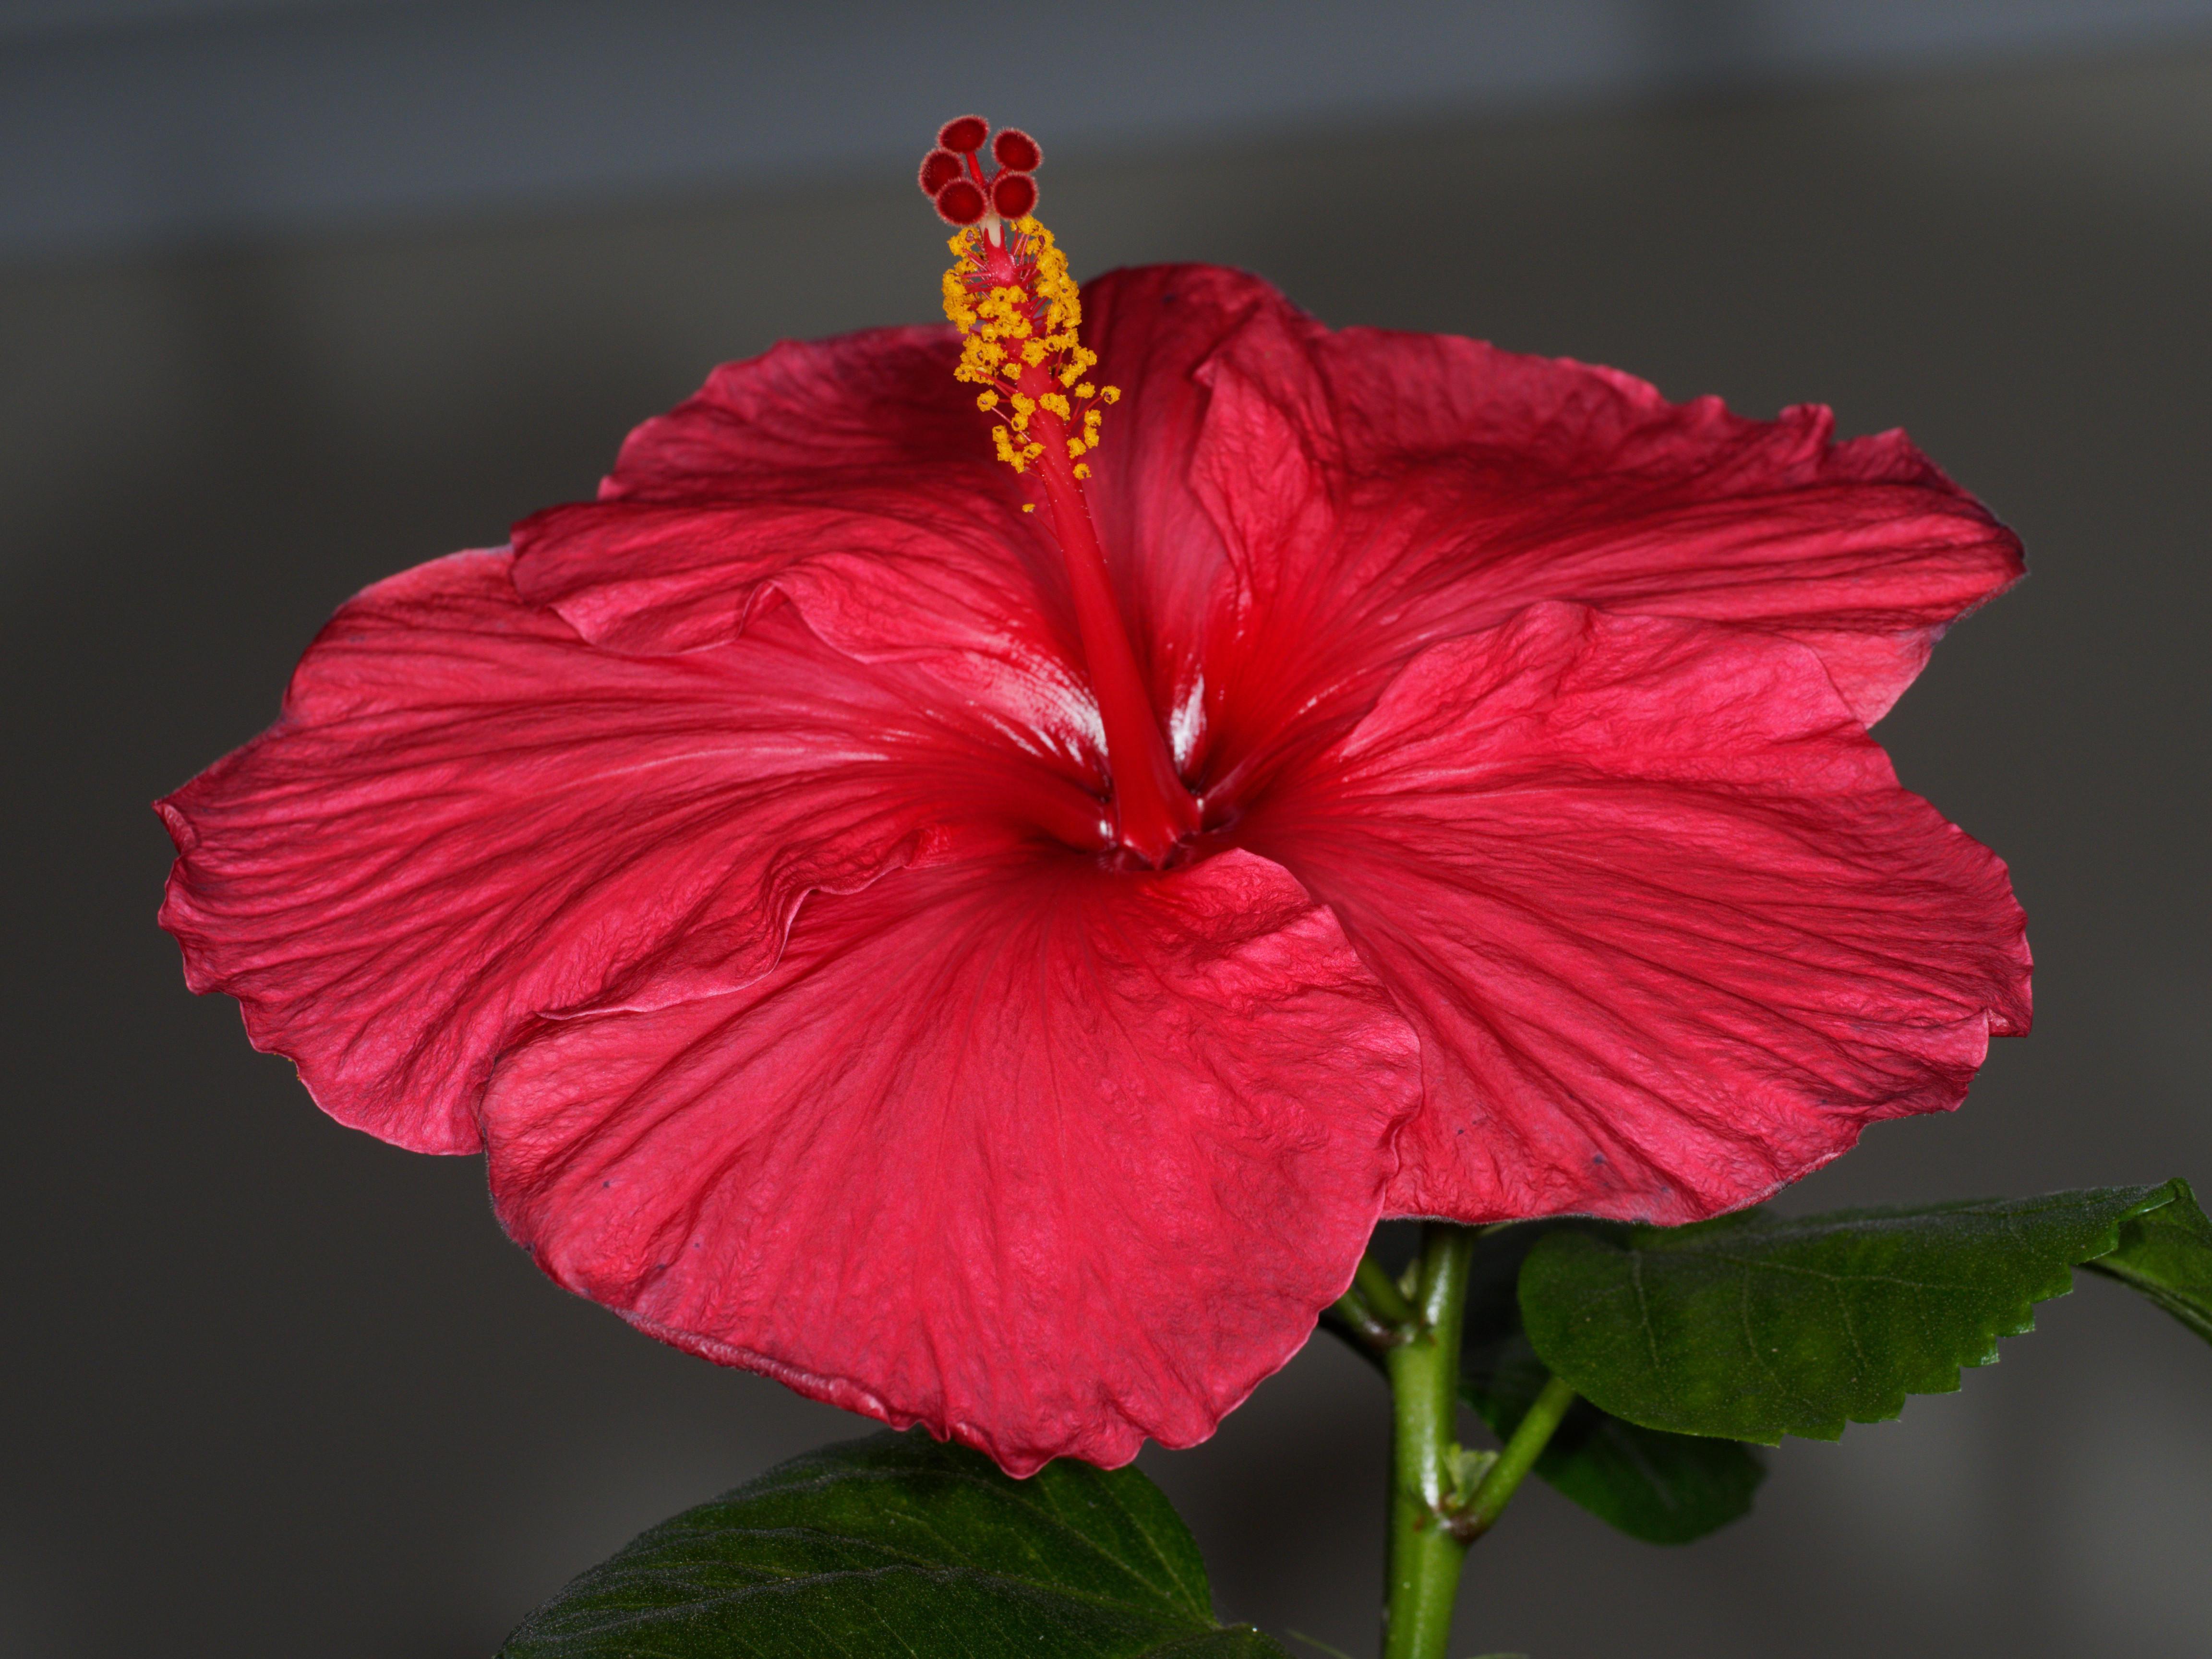 Hibiscus-STF-8-3.jpeg